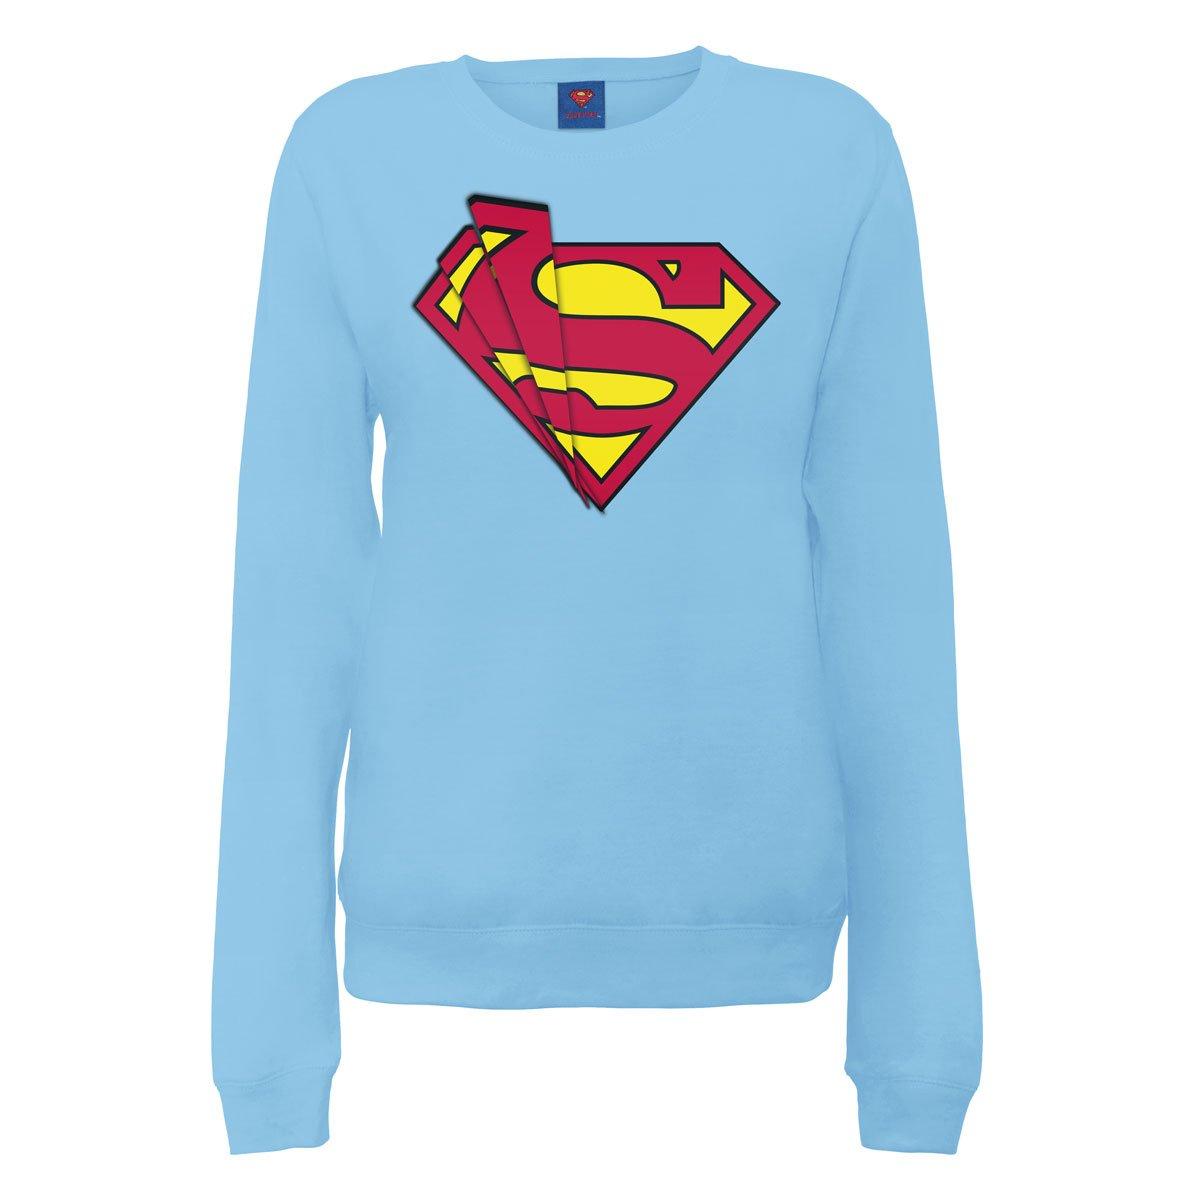 DC Comics Official Superman Shards Logo Womens Sweatshirt - Sudadera Mujer DC0003031